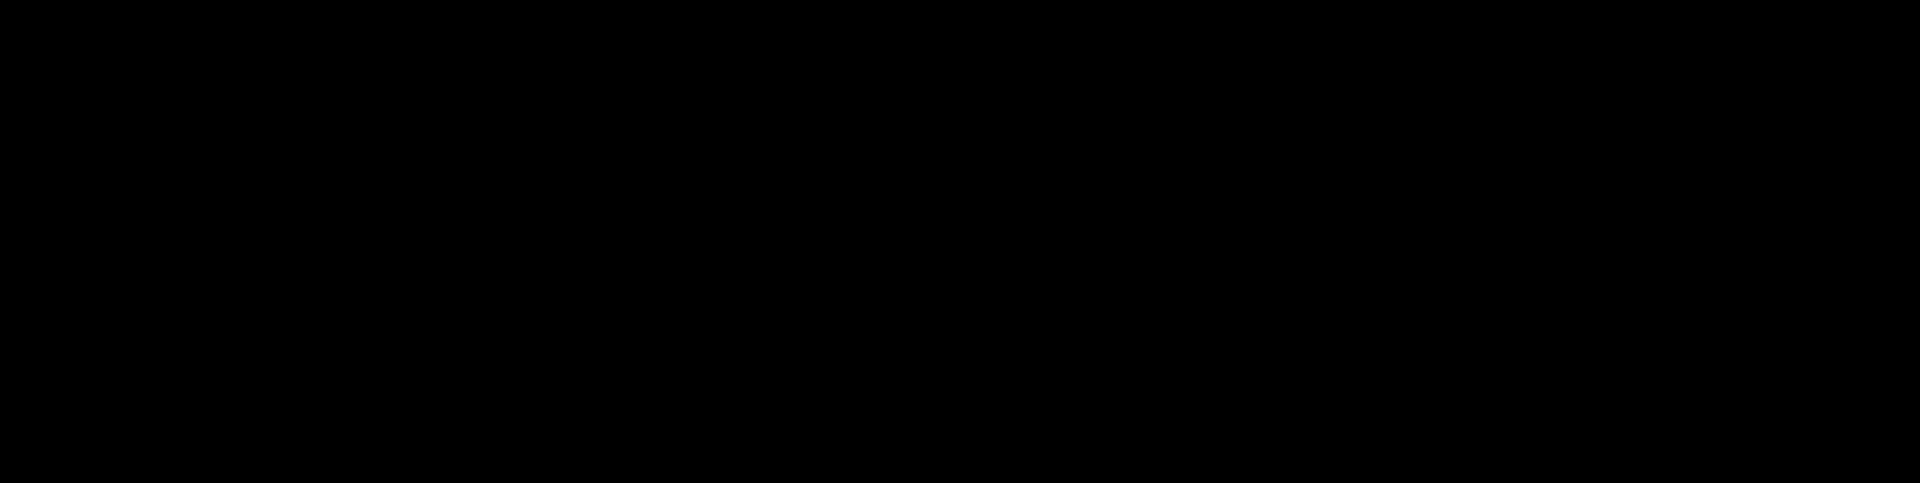 kl_mag_change_my-herbarium_hyaluronic-acid-wheat